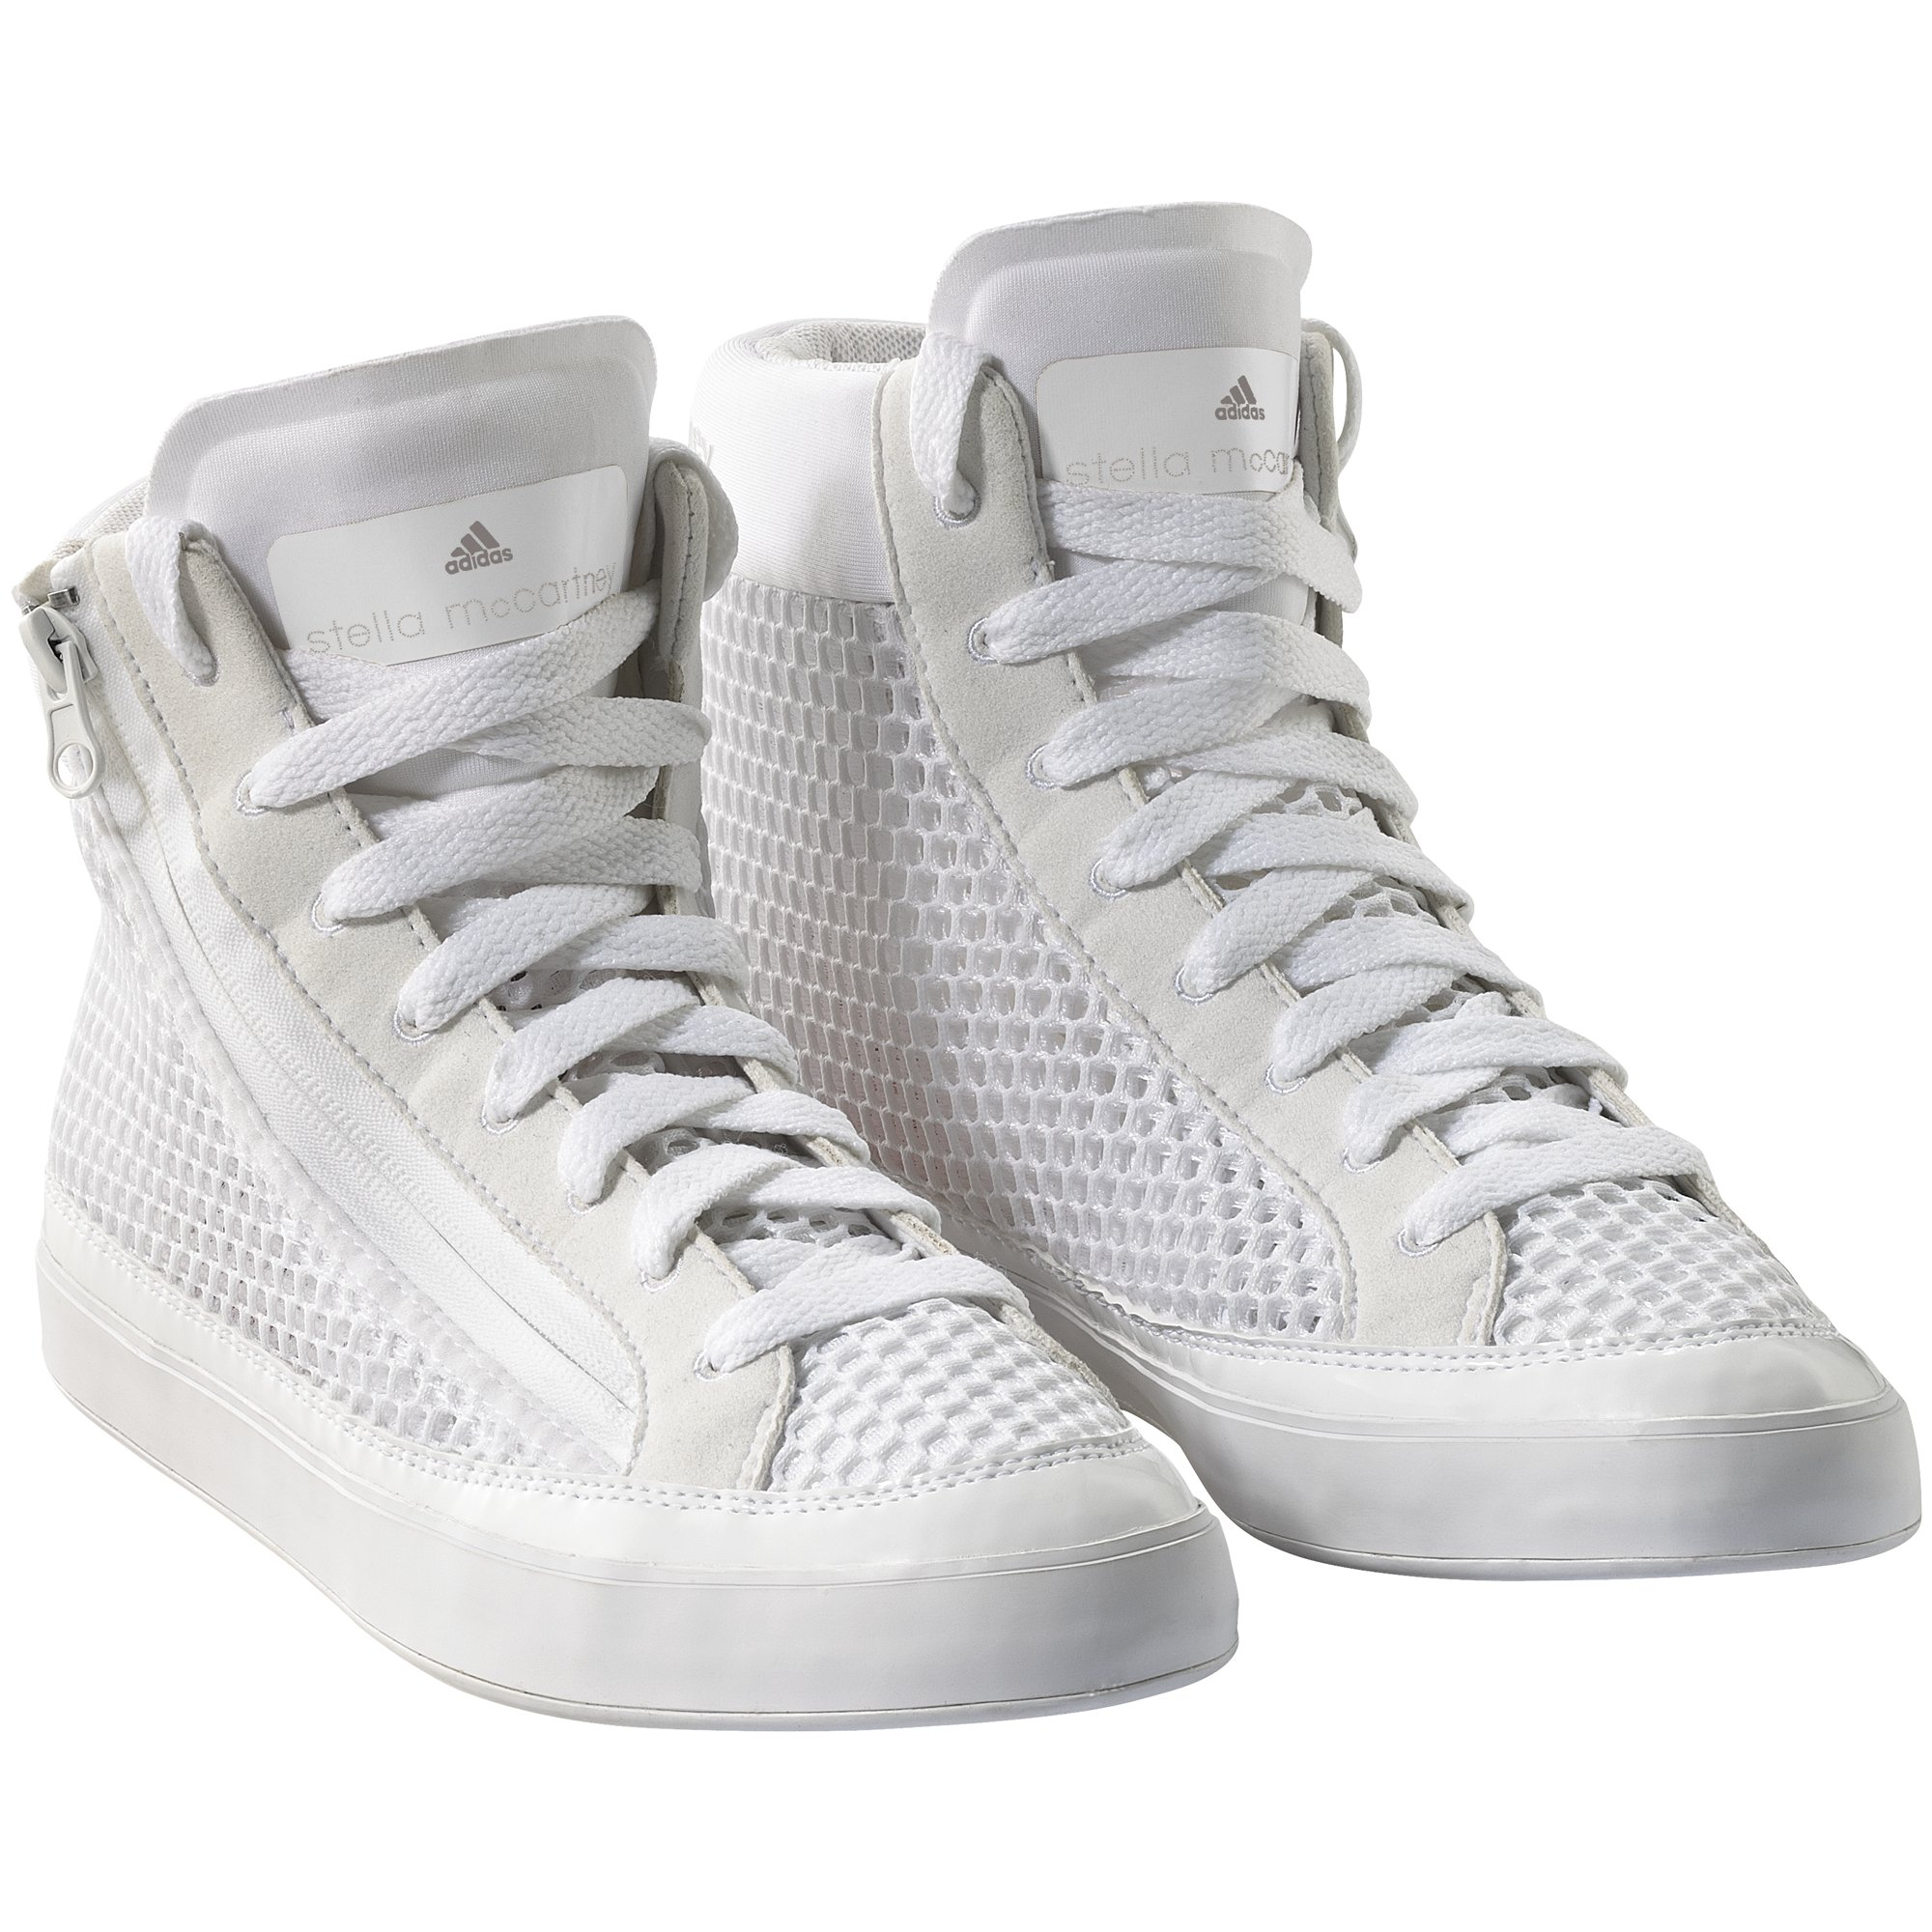 new concept 5d778 71216 Chaussures Adidas - adidas Femmes Chaussure Psittaci  (Mode)  Adidas  Chaussure Psittaci Chaussures Adidas promo adidas Femmes Chaussure Psittaci prix  promo ...